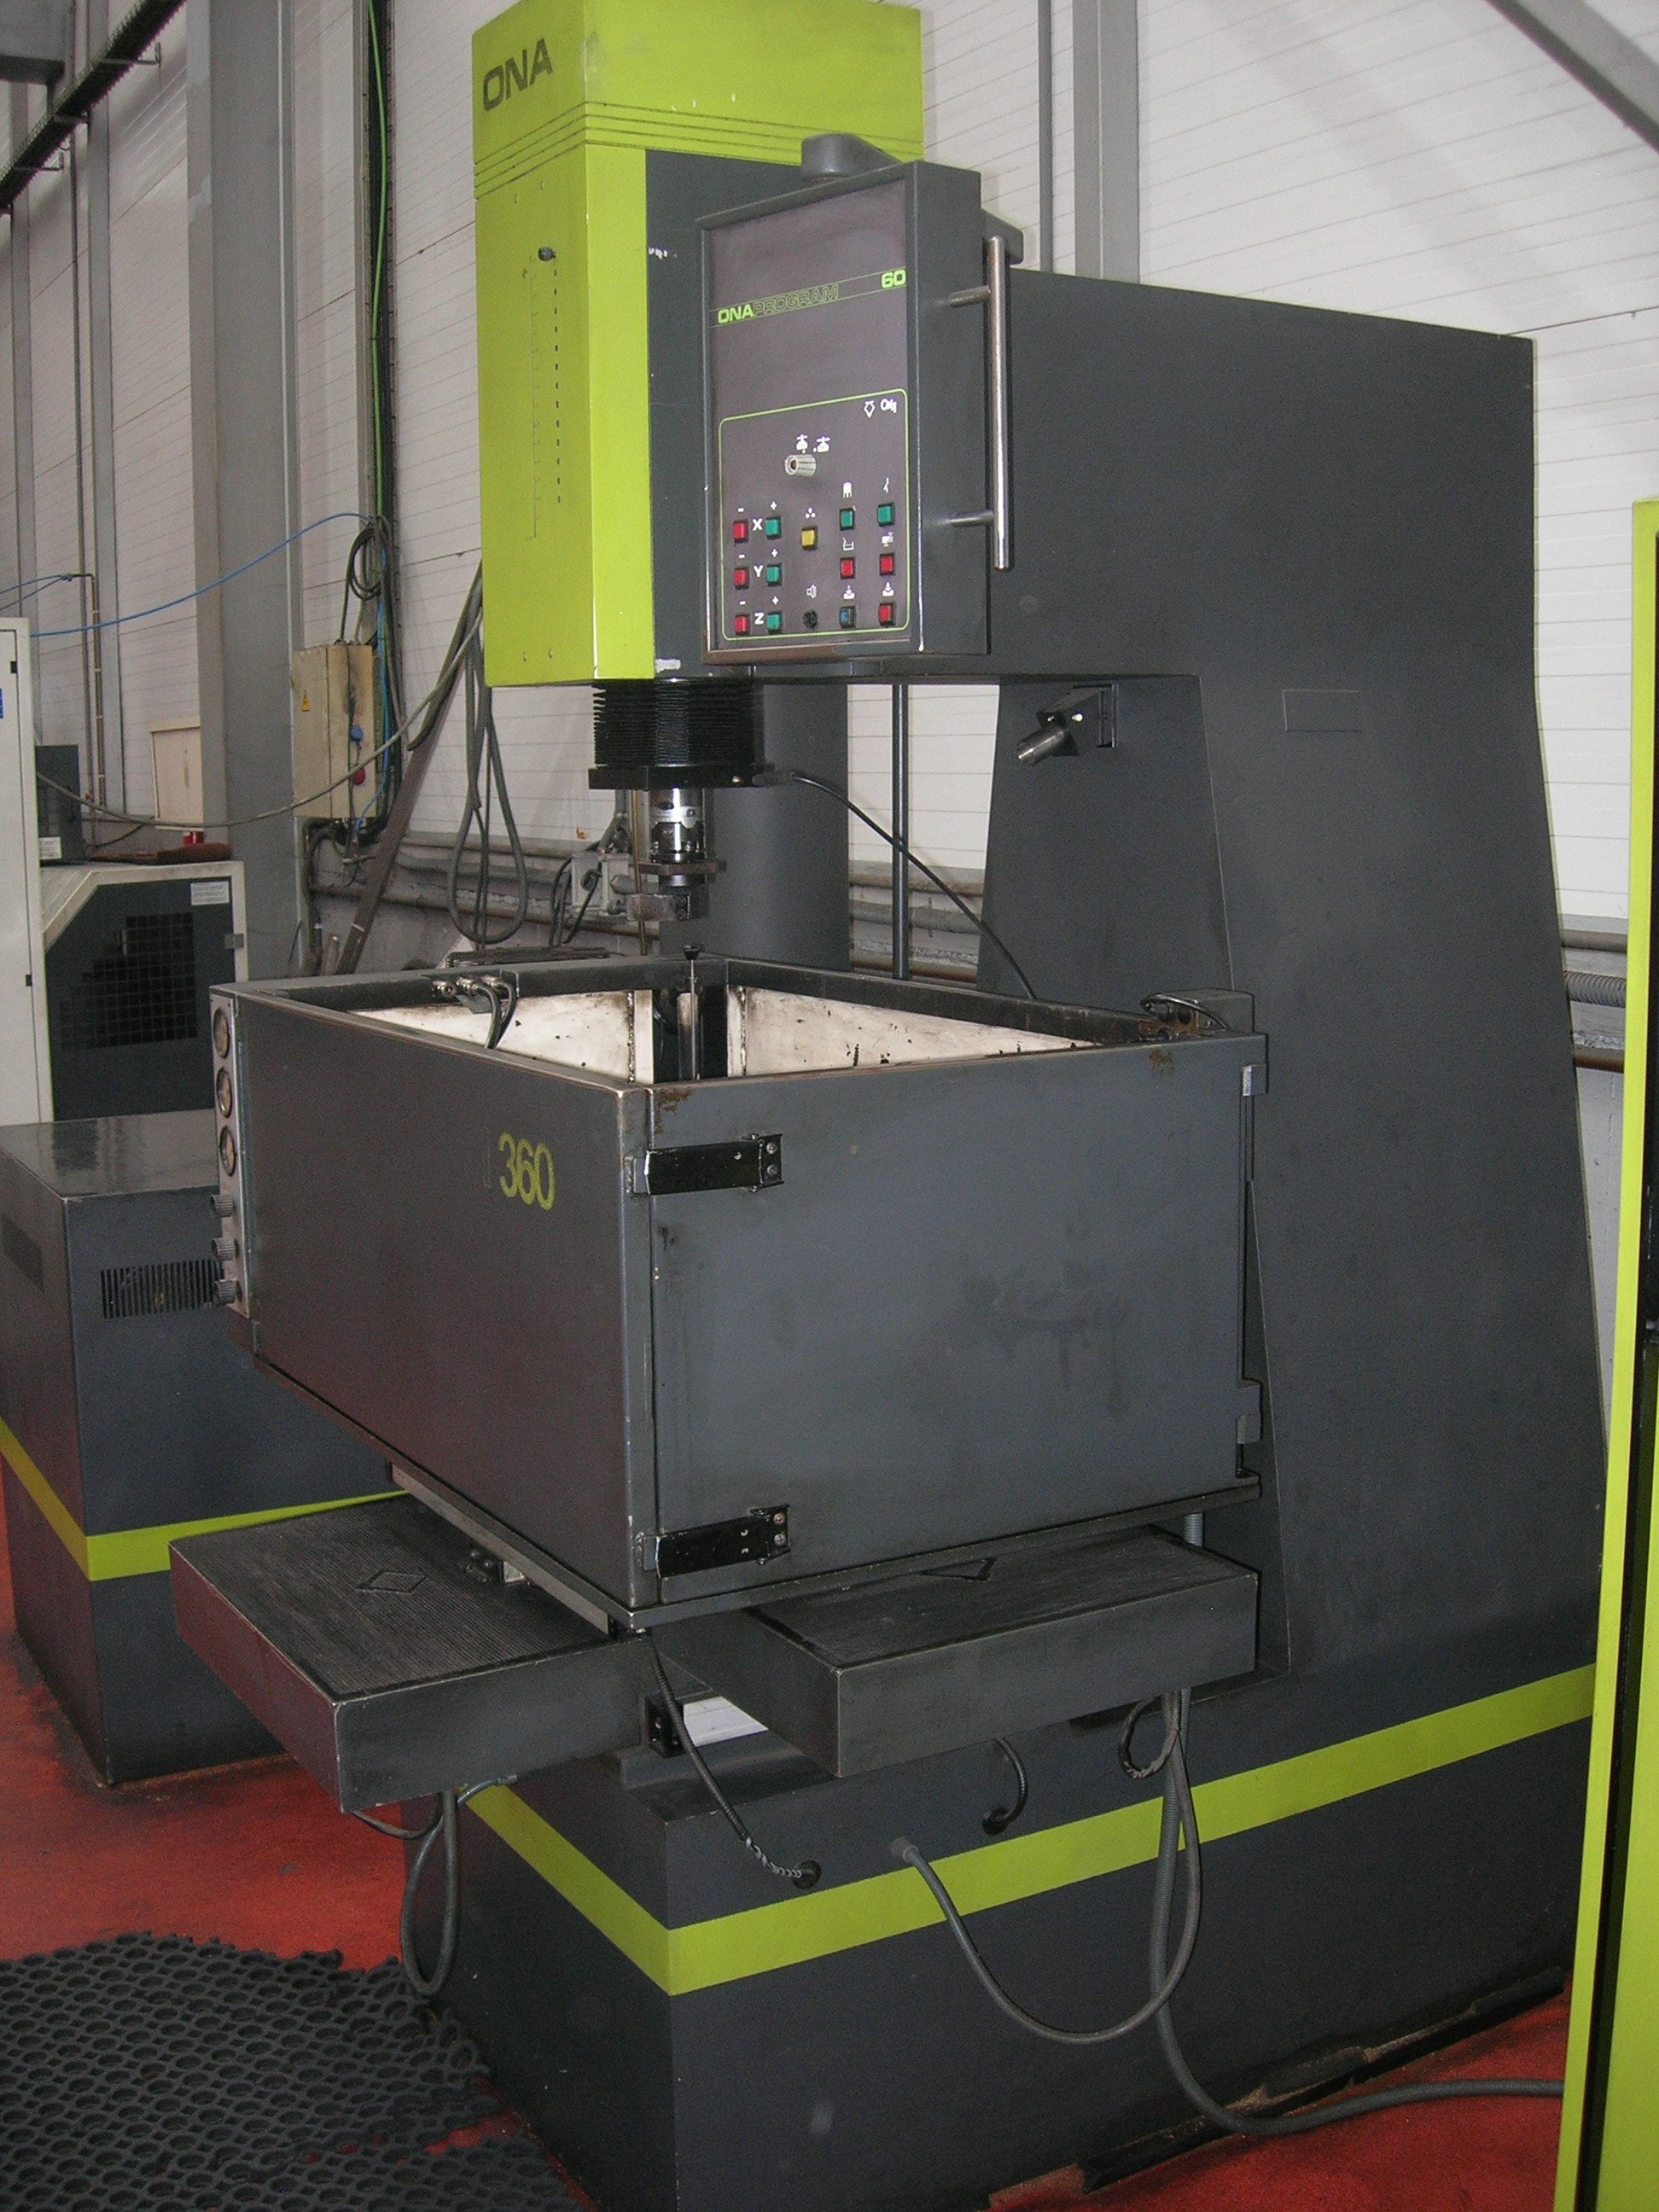 Máquina de electroerosión por penetración Ona 360 Maquinas de segunda mano - Exapro